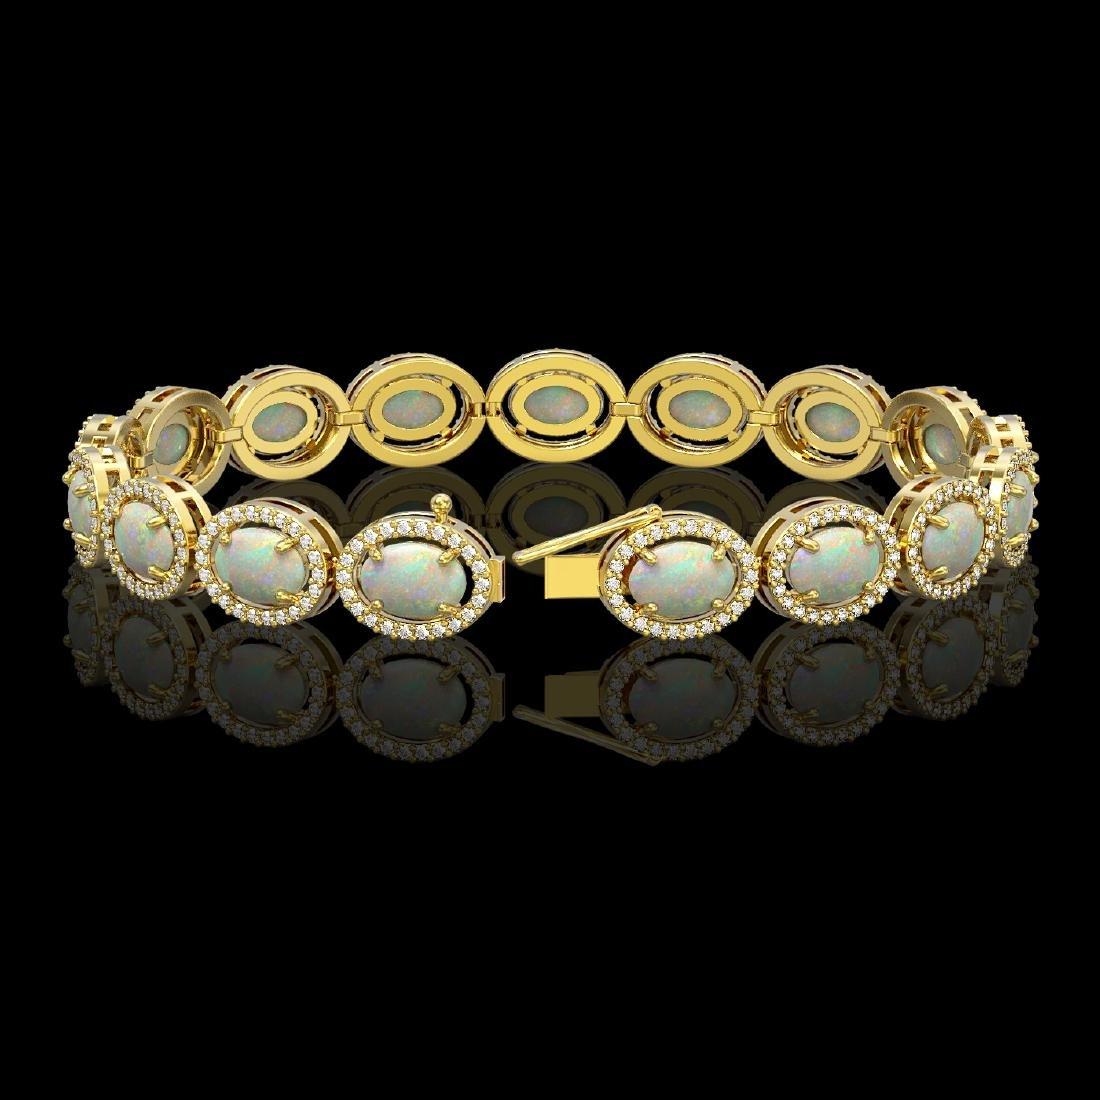 14.24 CTW Opal & Diamond Halo Bracelet 10K Yellow Gold - 2